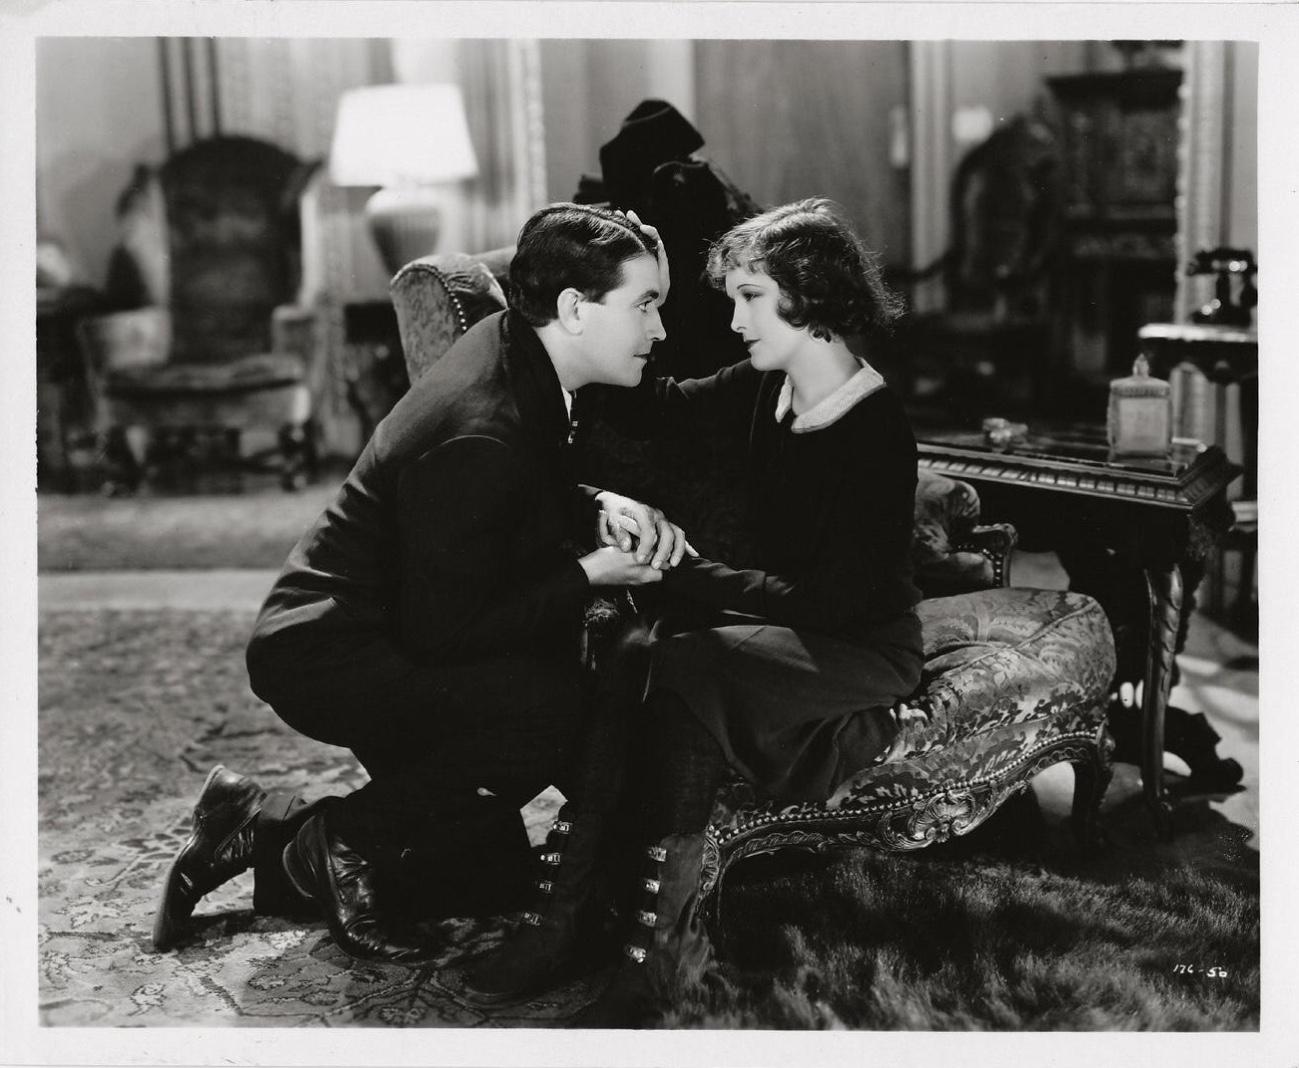 Richard Barthelmess and Marian Nixon in Young Nowheres (1929)